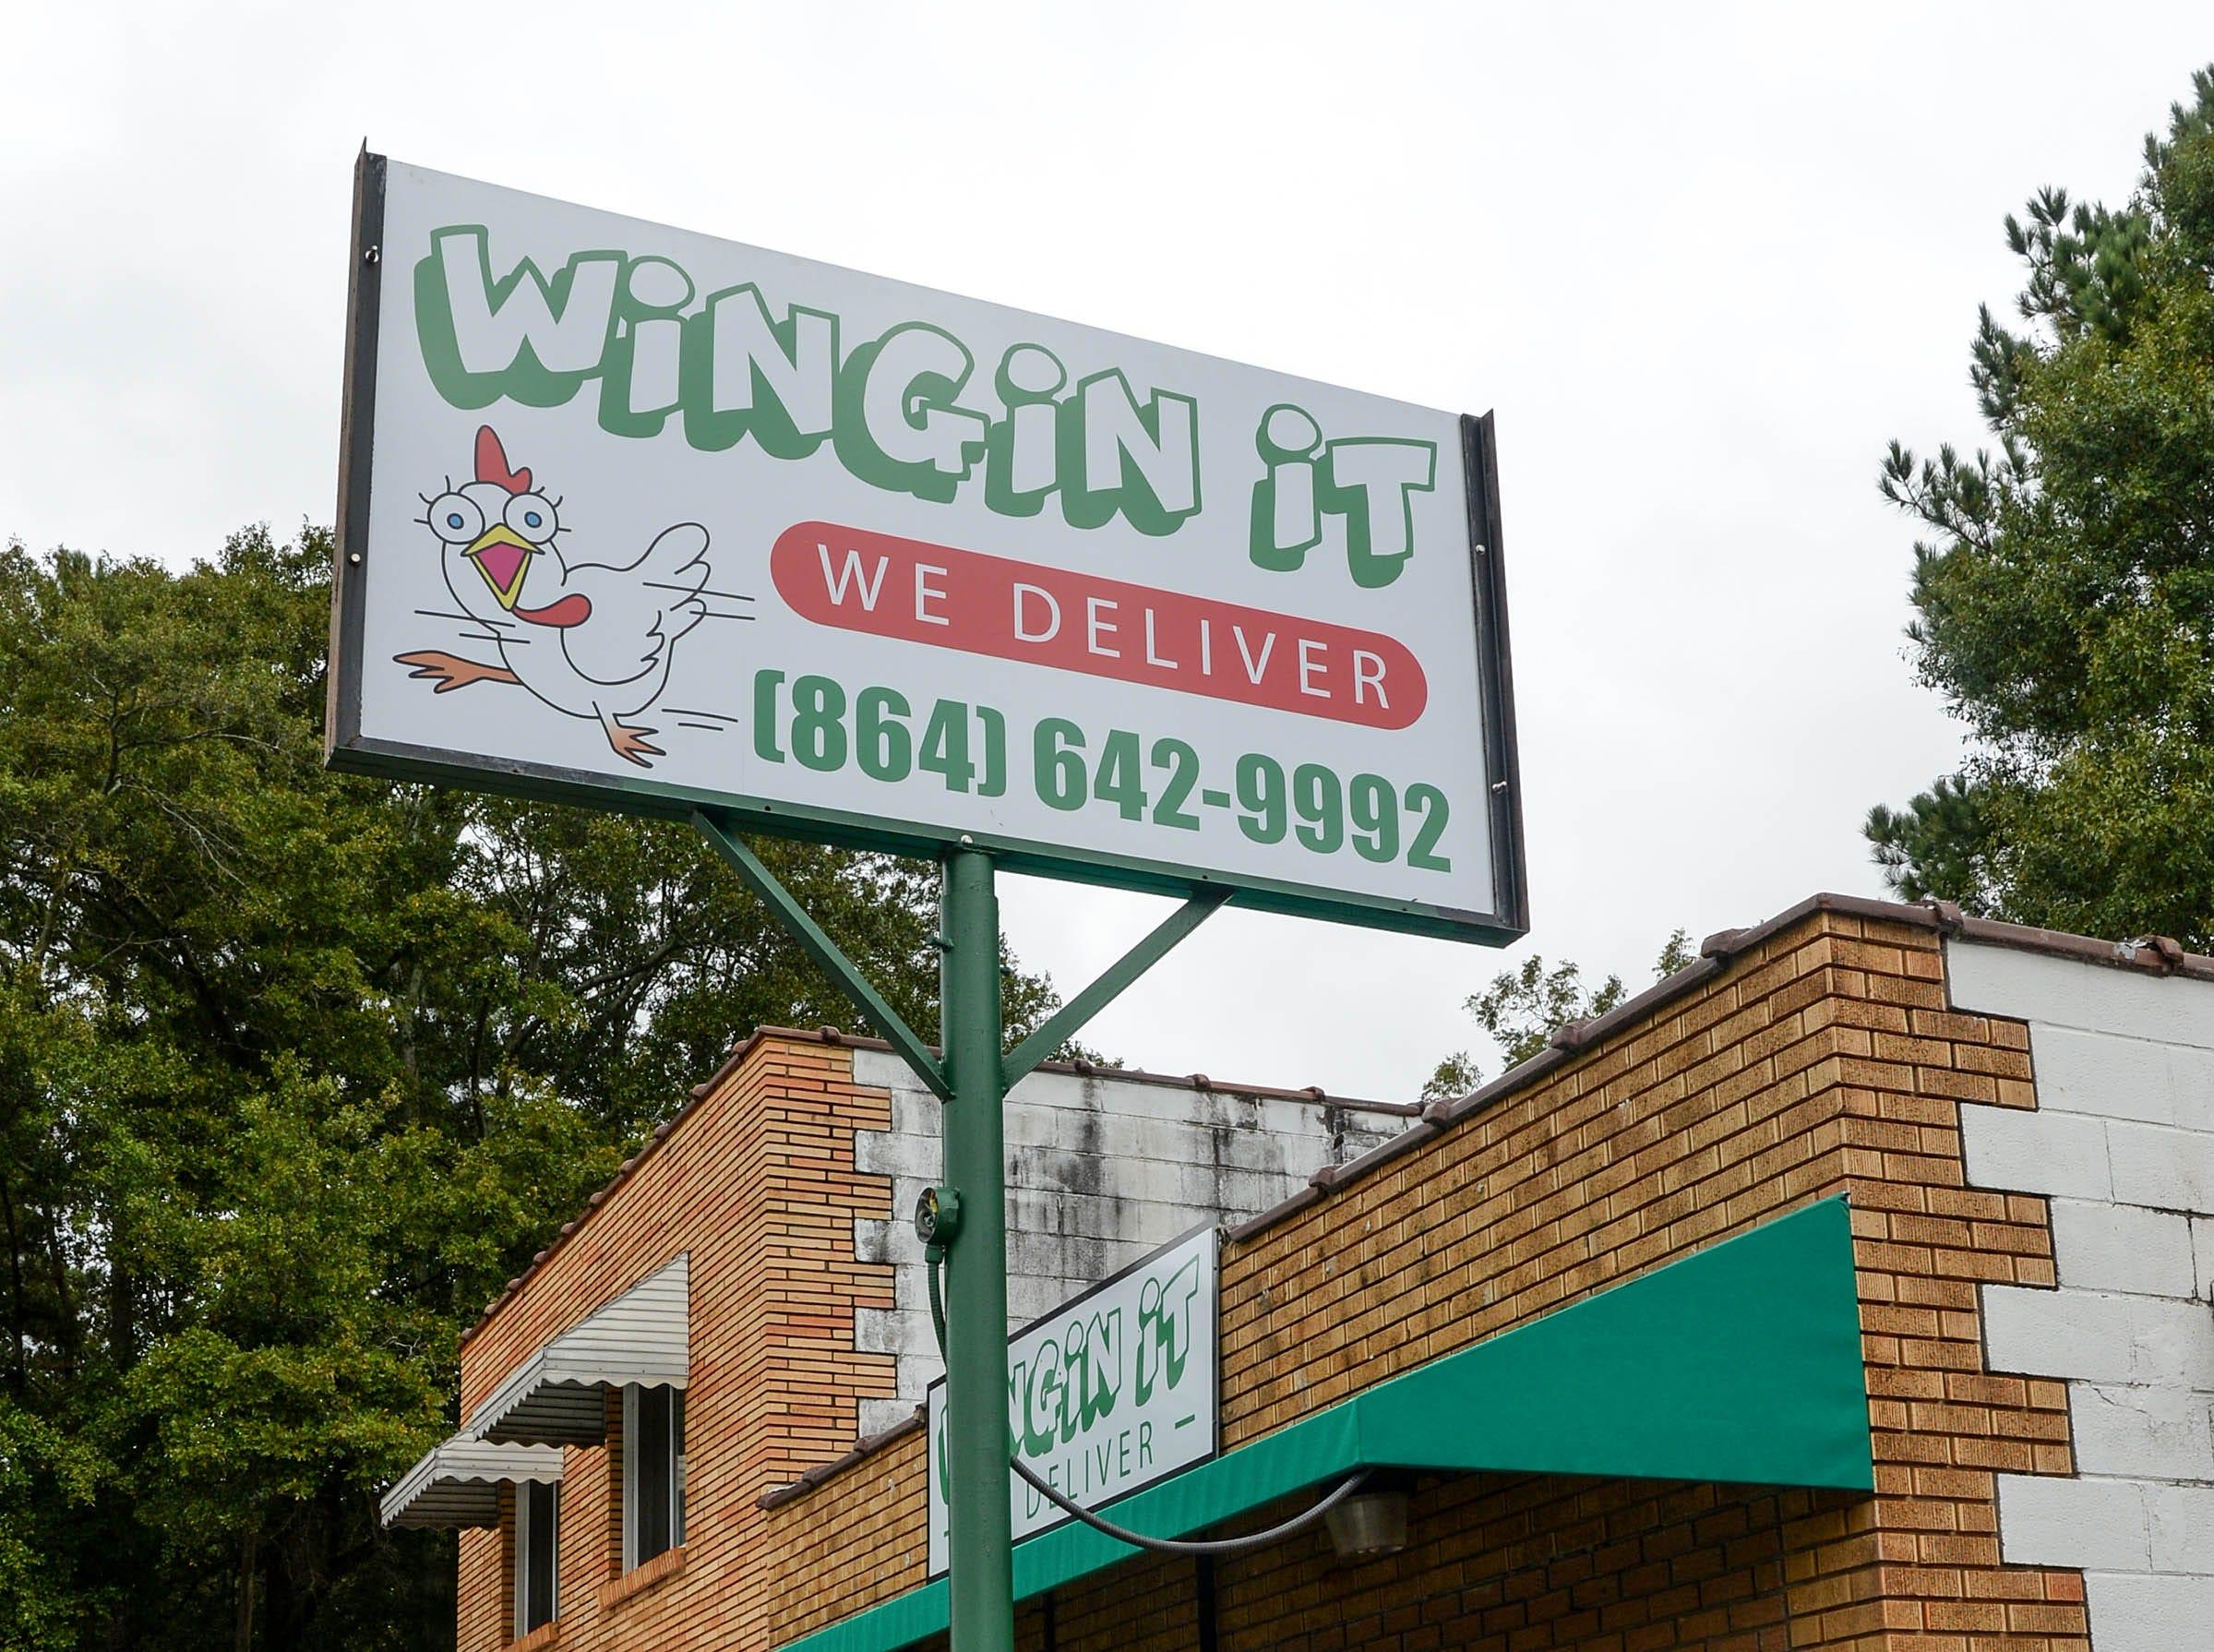 Wingin It on the Belton Highway in Anderson, across from Nutty Sweet Shop.